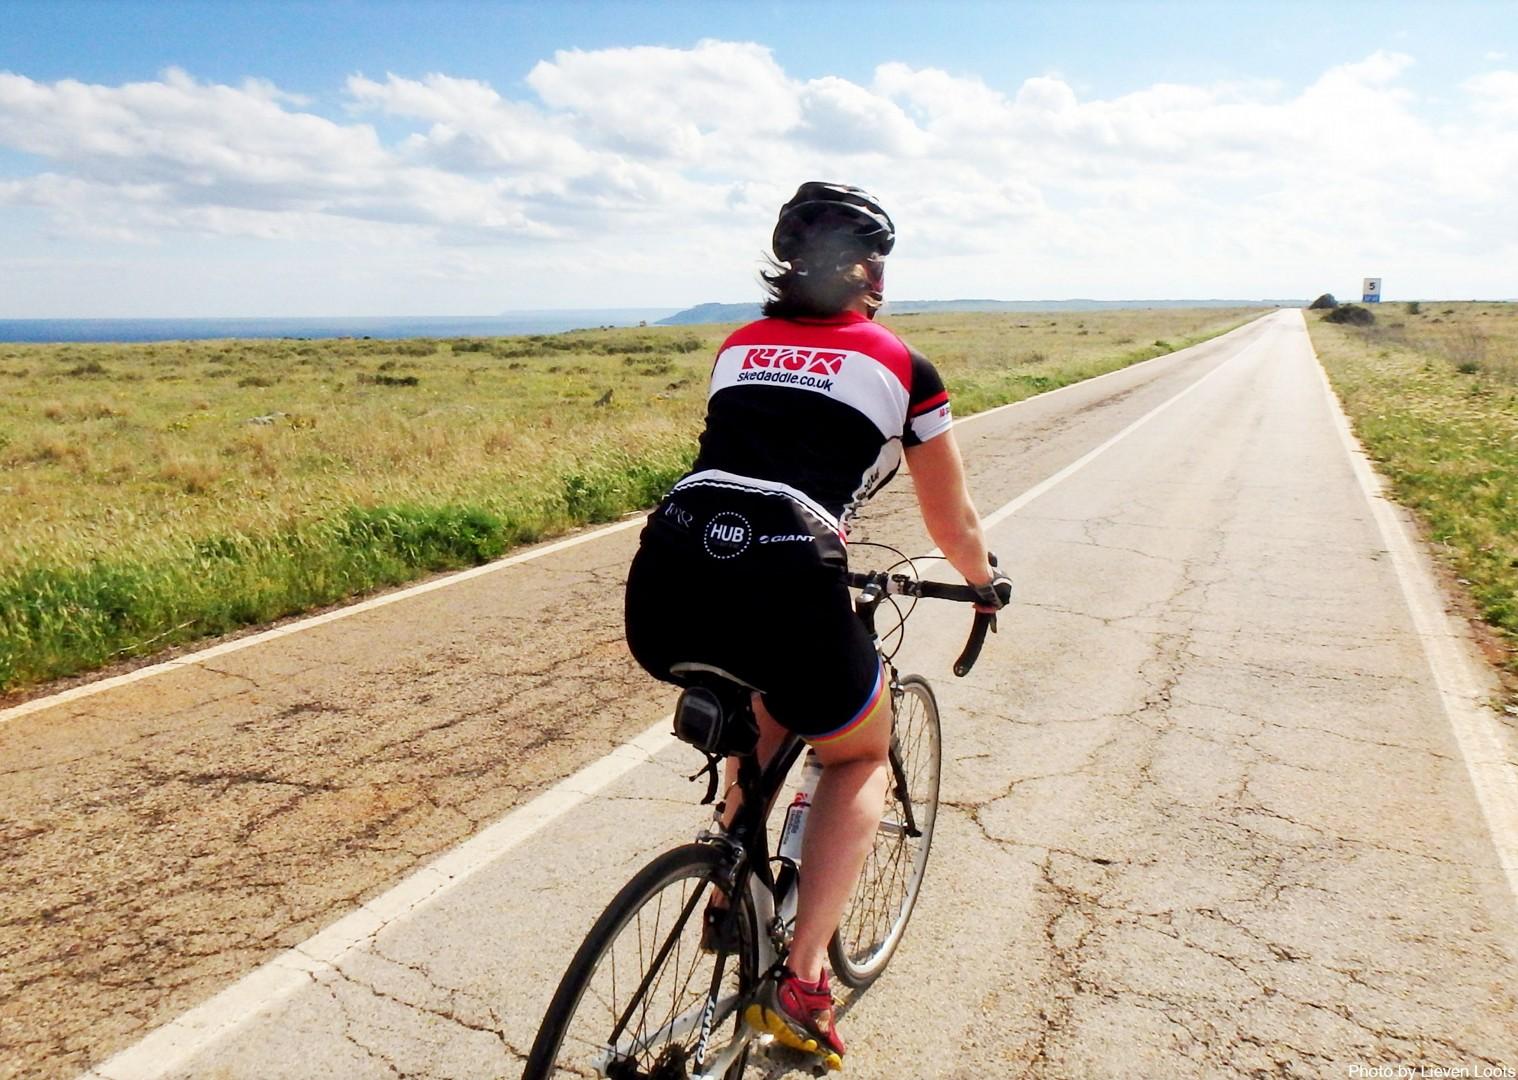 self-guided-road-cycling-holiday.jpg - Italy - Puglia - The Heel of Italy - Self-Guided Road Cycling Holiday - Road Cycling